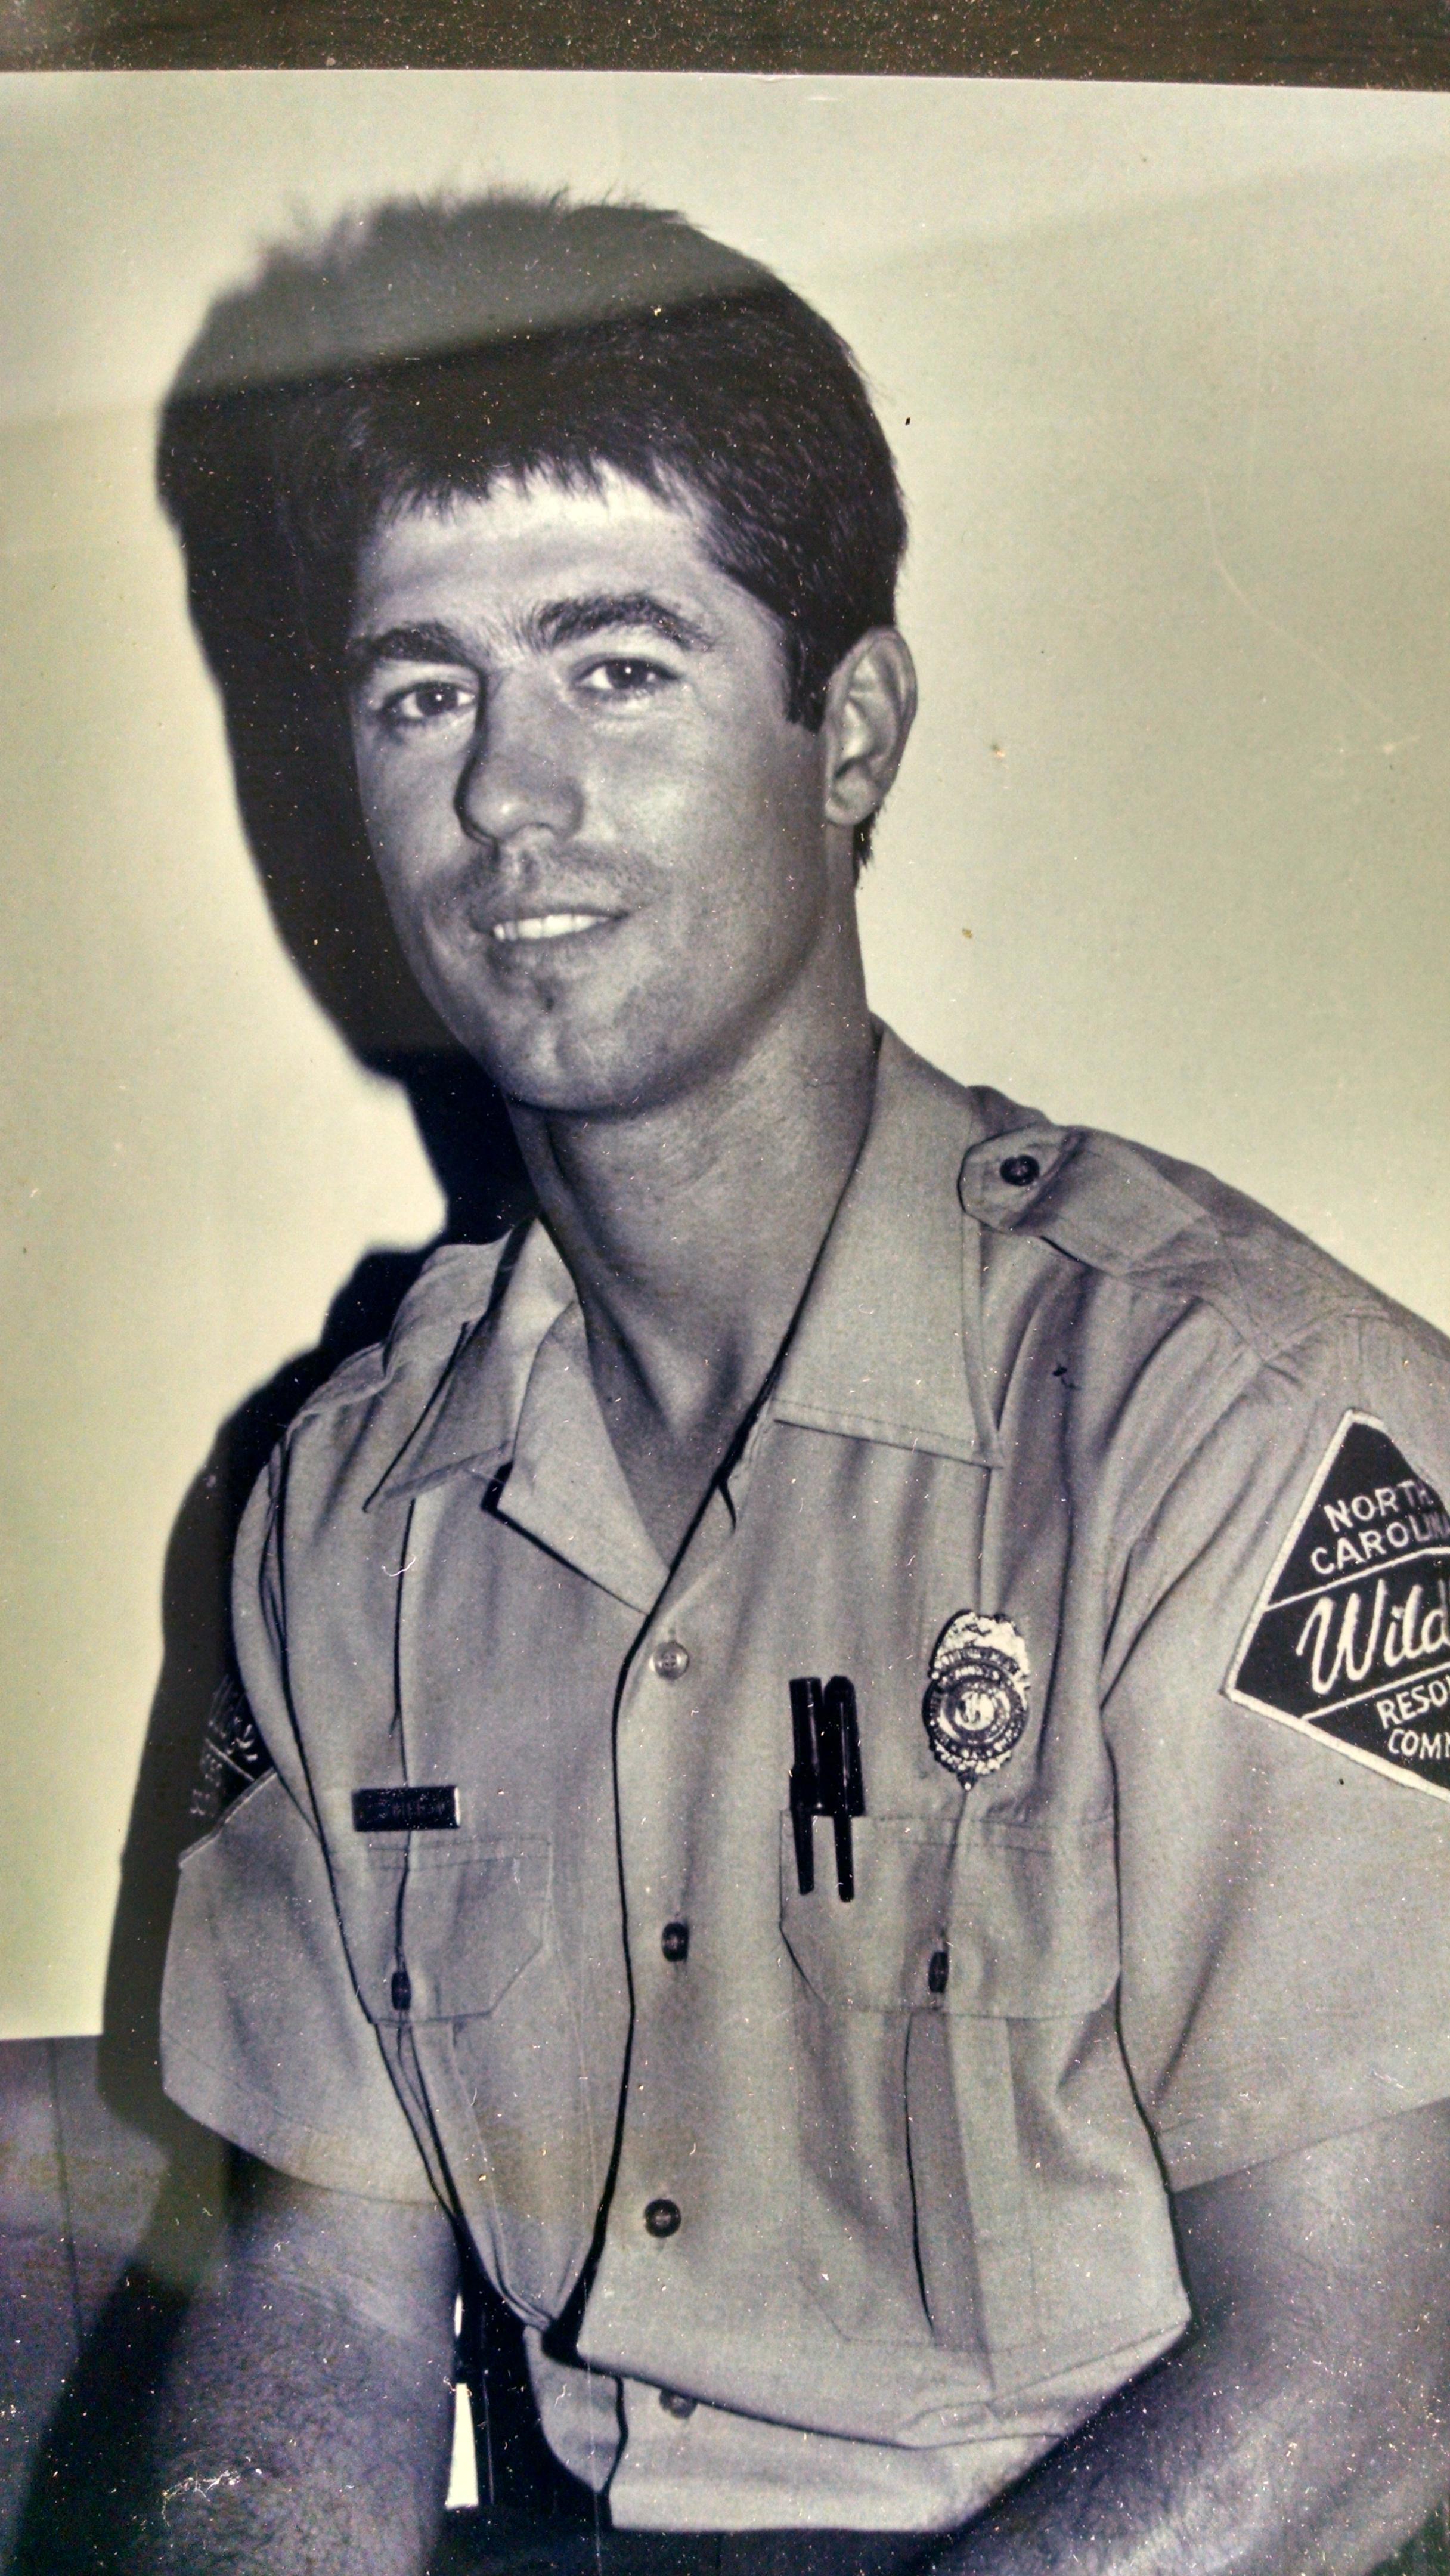 Wildlife Officer William A. Williamson | North Carolina Wildlife Resources Commission, North Carolina